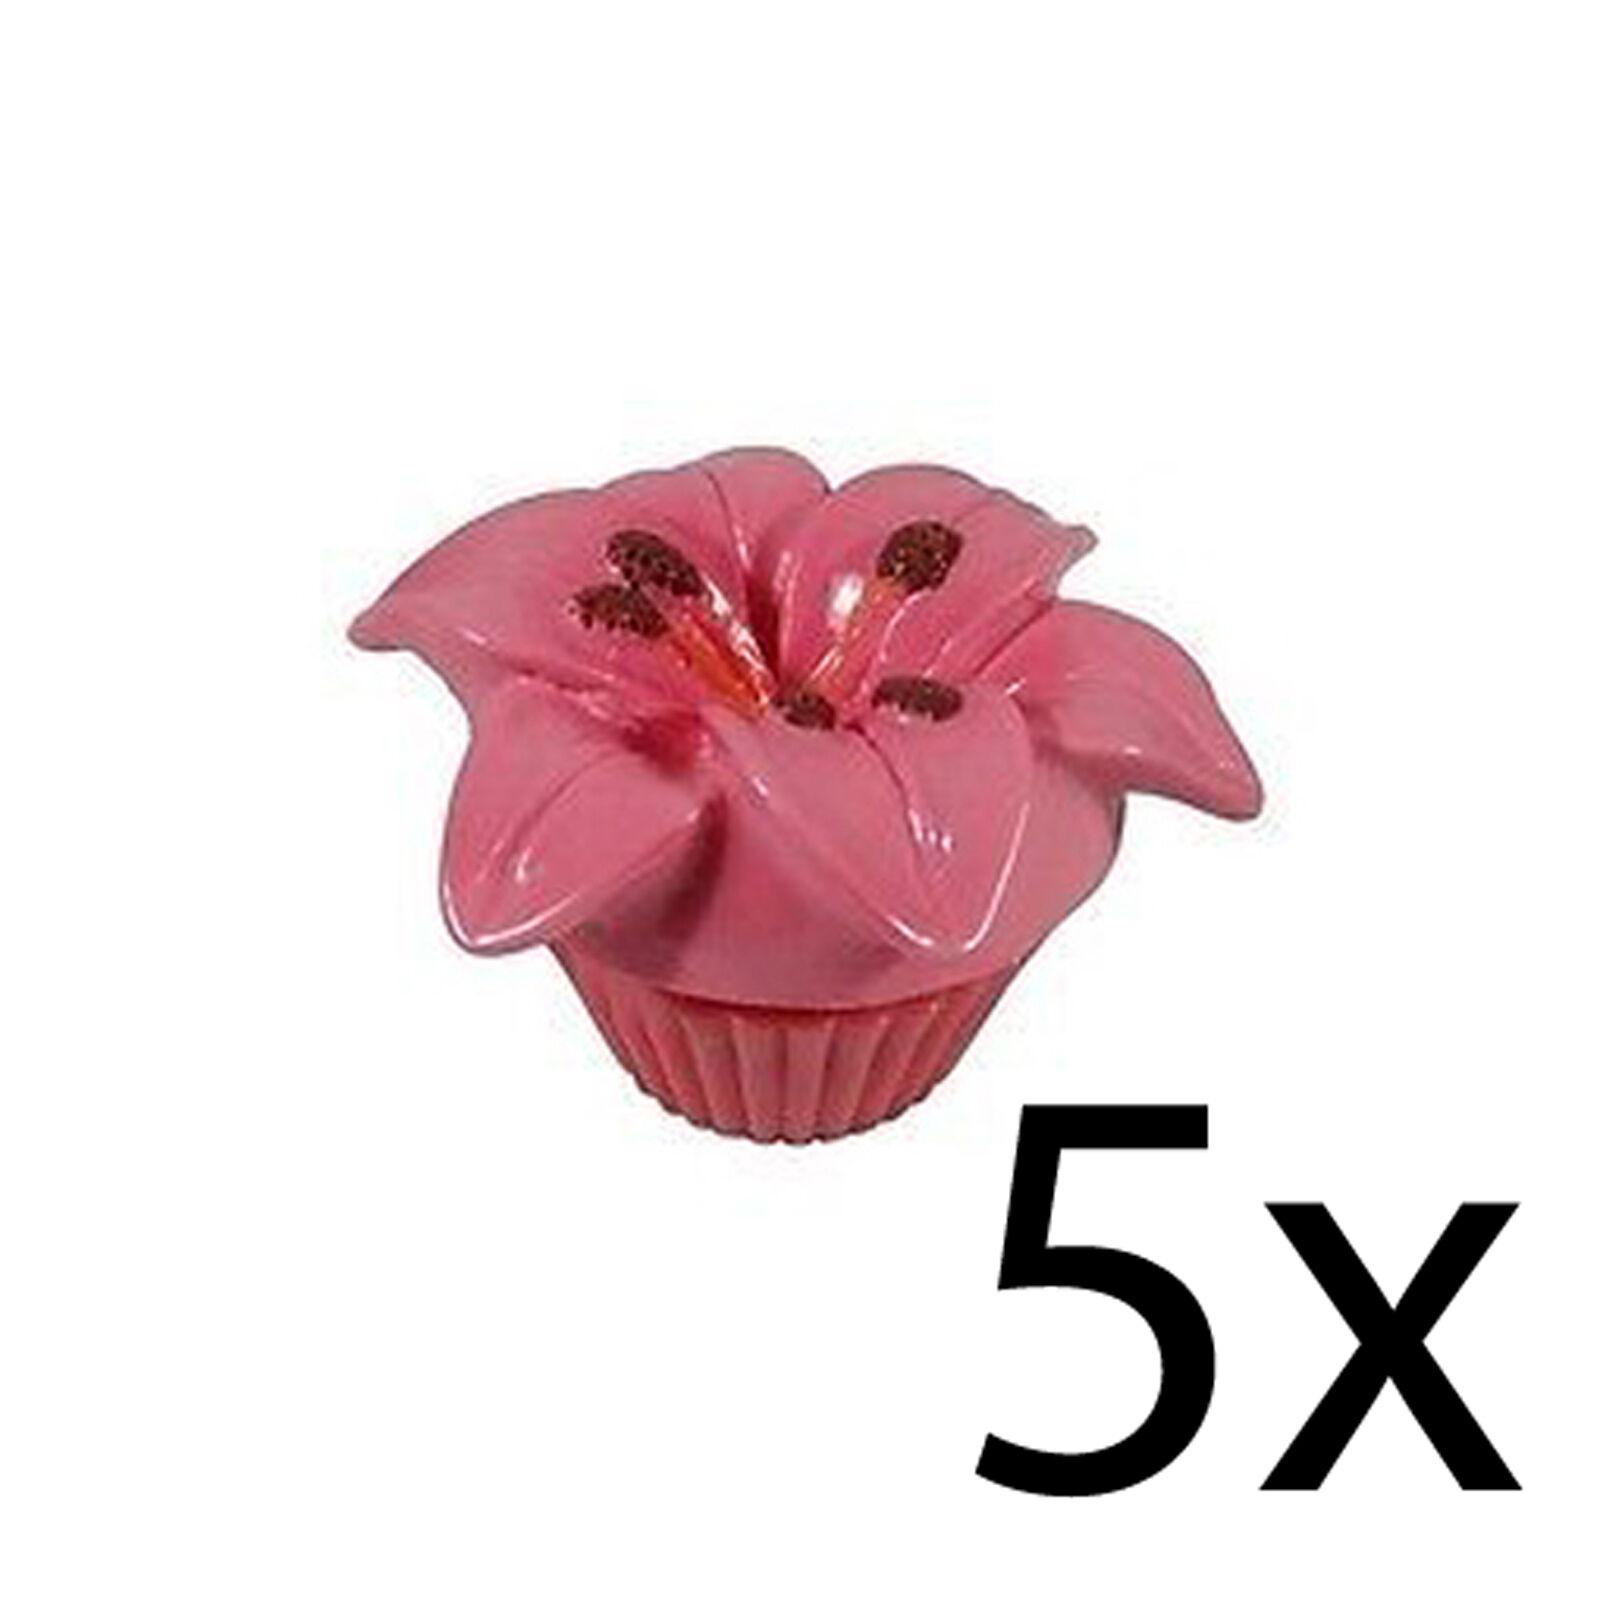 Lip balm flower scented floral gloss moisturising nourishing pot picture 1 of 1 mightylinksfo